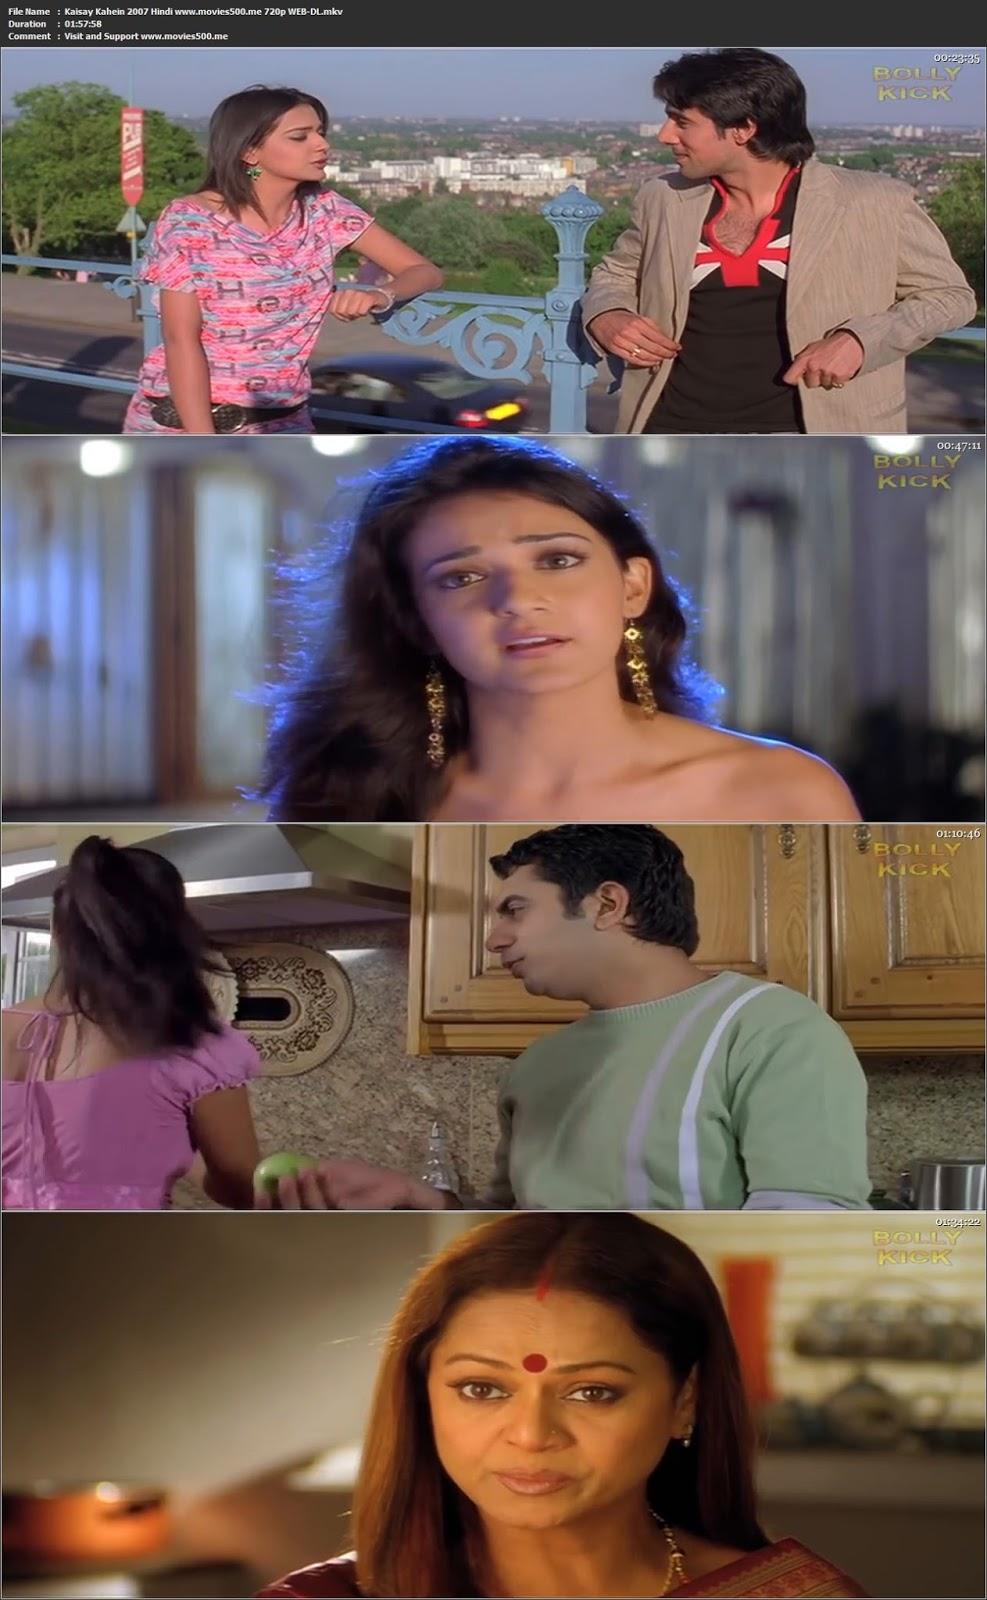 Kaisay Kahein 2007 Hindi Full Movie WEB DL 720p at freedomcopy.com